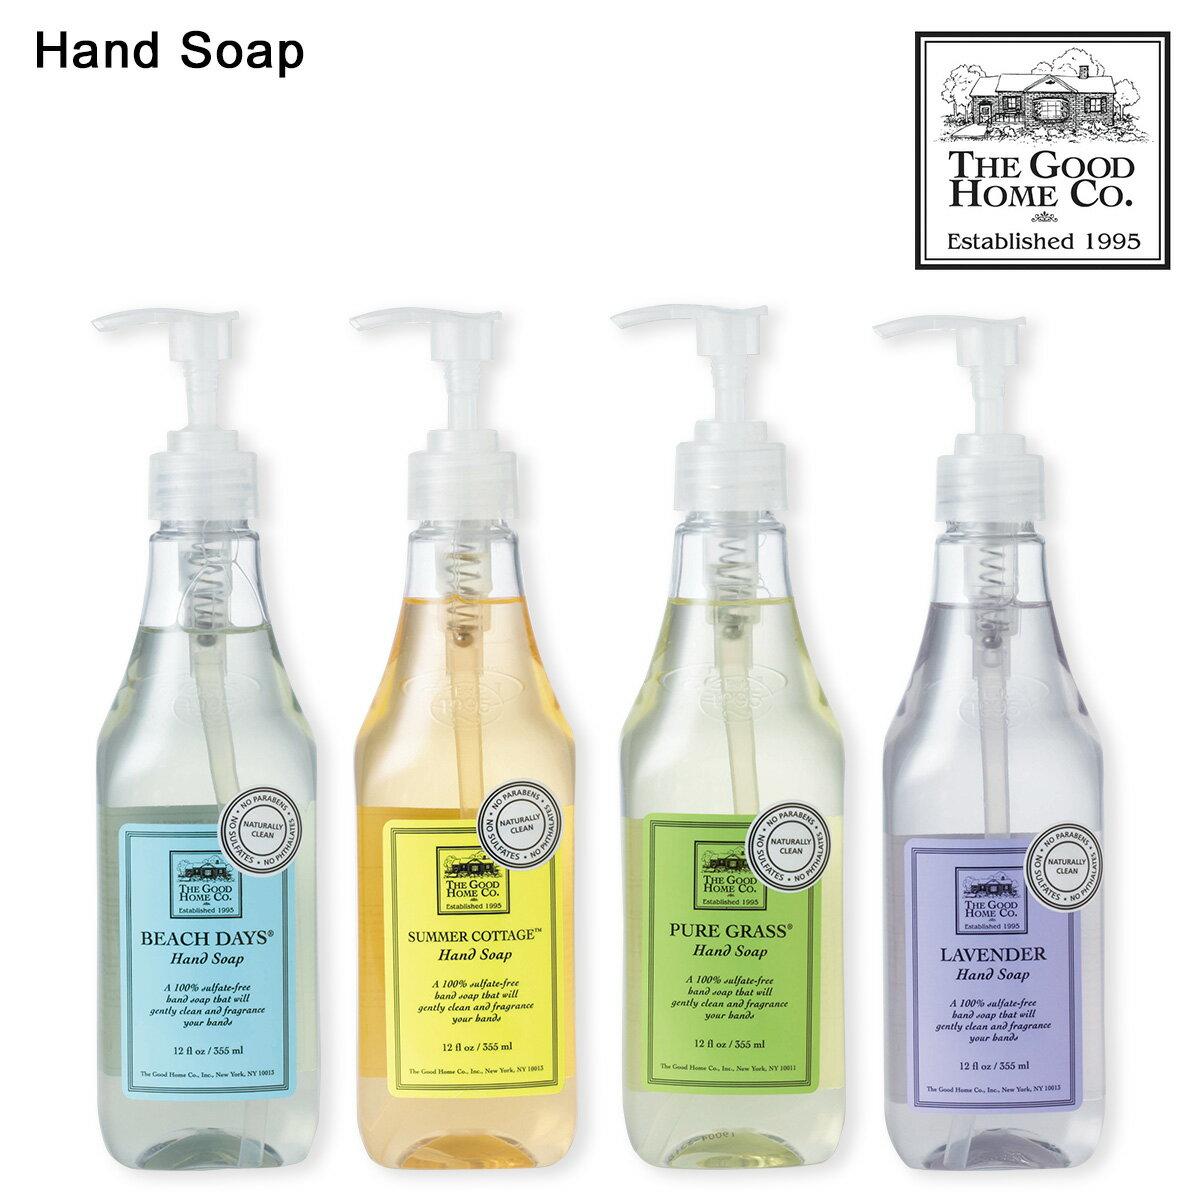 THE GOOD HOME CO ザ グッドホーム カンパニー ハンドソープ 石鹸 せっけん ギフト 355ml HAND SOAP 【海外発送不可】